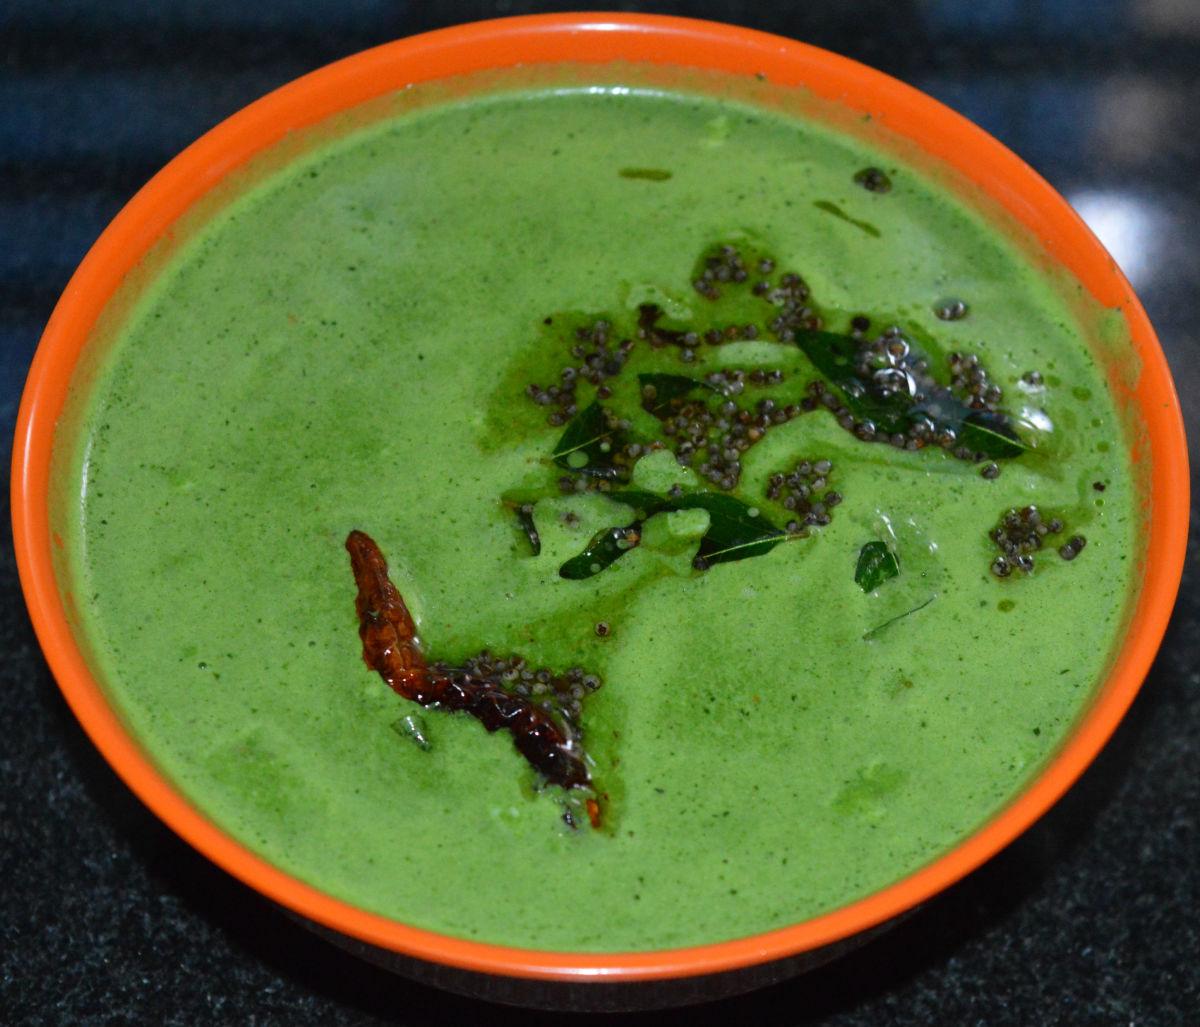 Leafy Vegetable Tambli (Leafy Greens Drink)